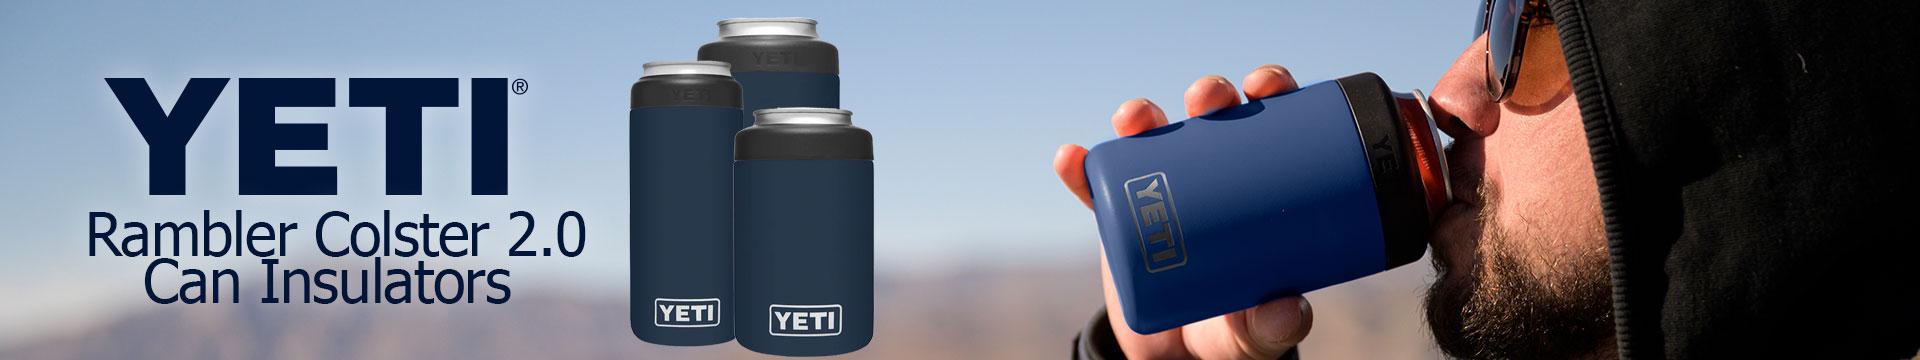 YETI Rambler Colster 2.0 Can Insulators